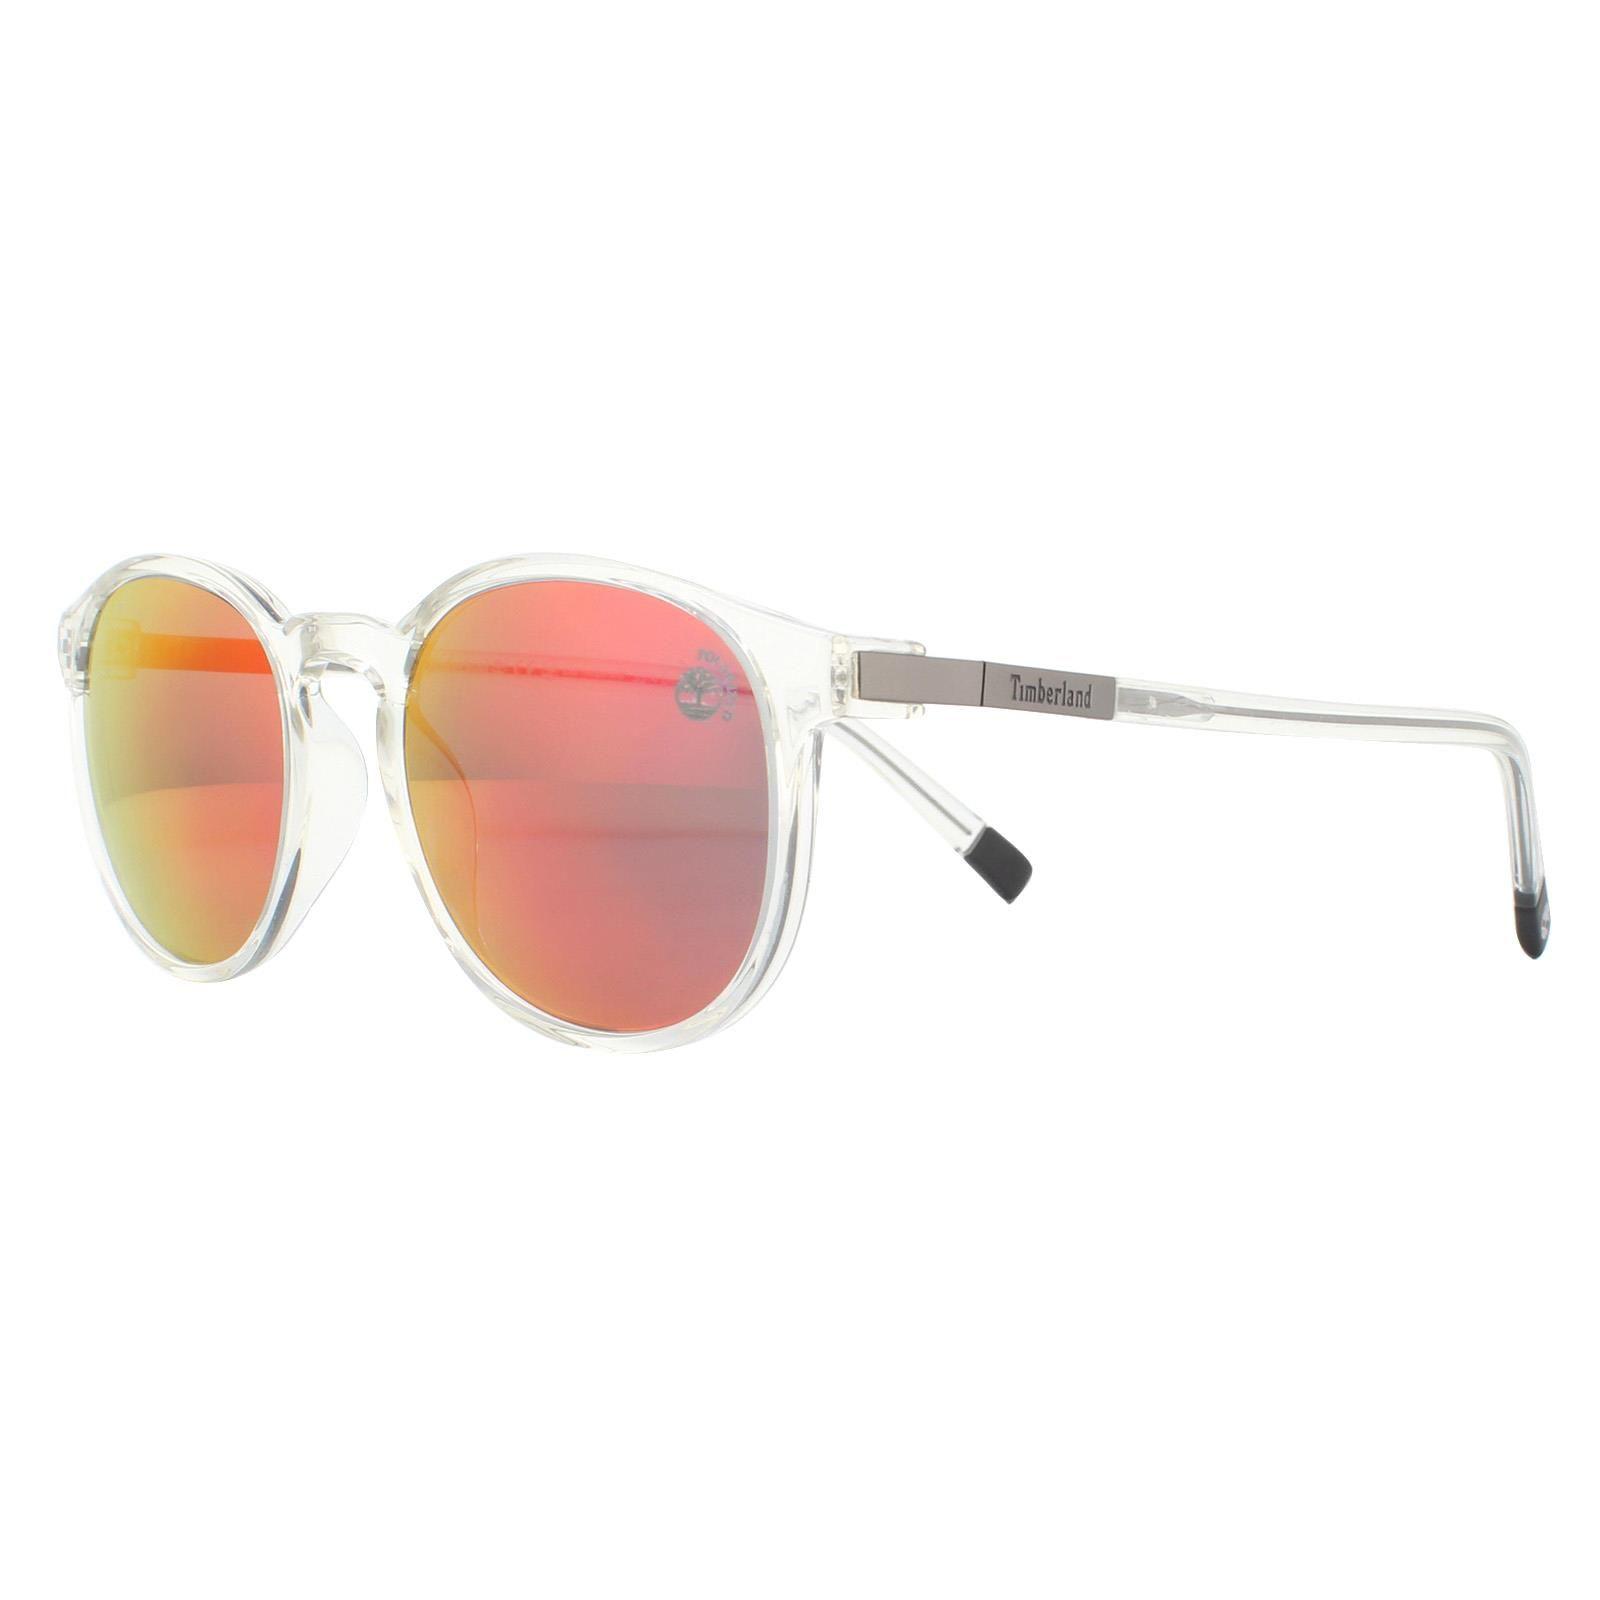 Timberland Sunglasses TB9151 26D Shiny Crystal Red Mirror Polarized